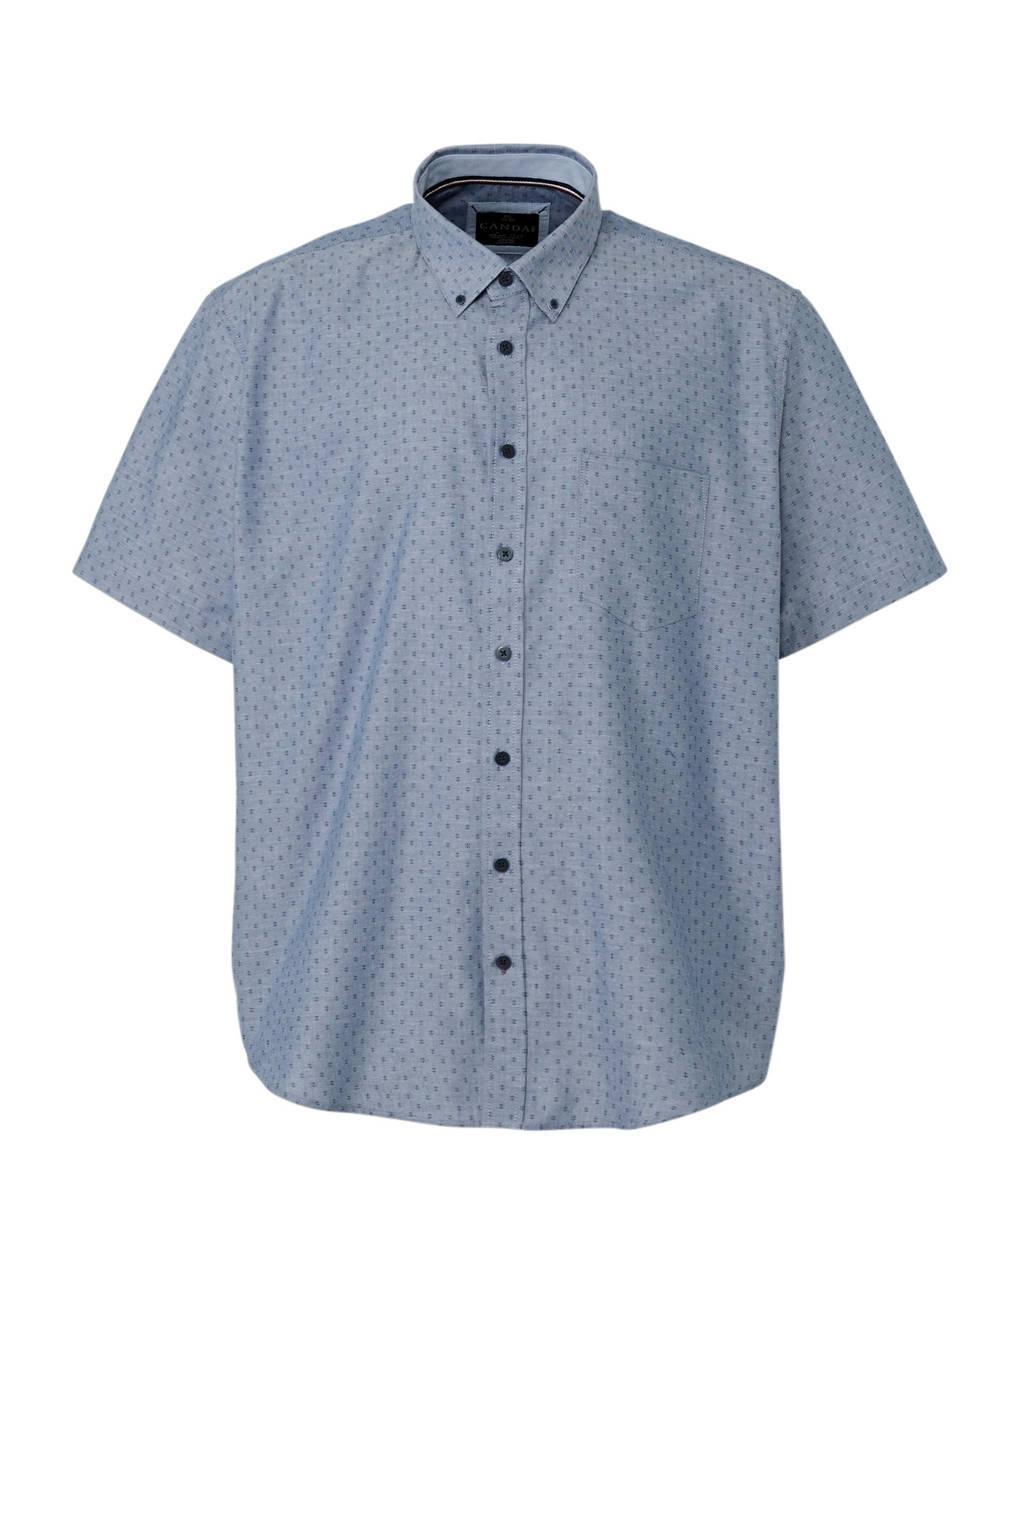 Overhemd Xl.C A Heren Xl Overhemd Met Allover Print Wehkamp